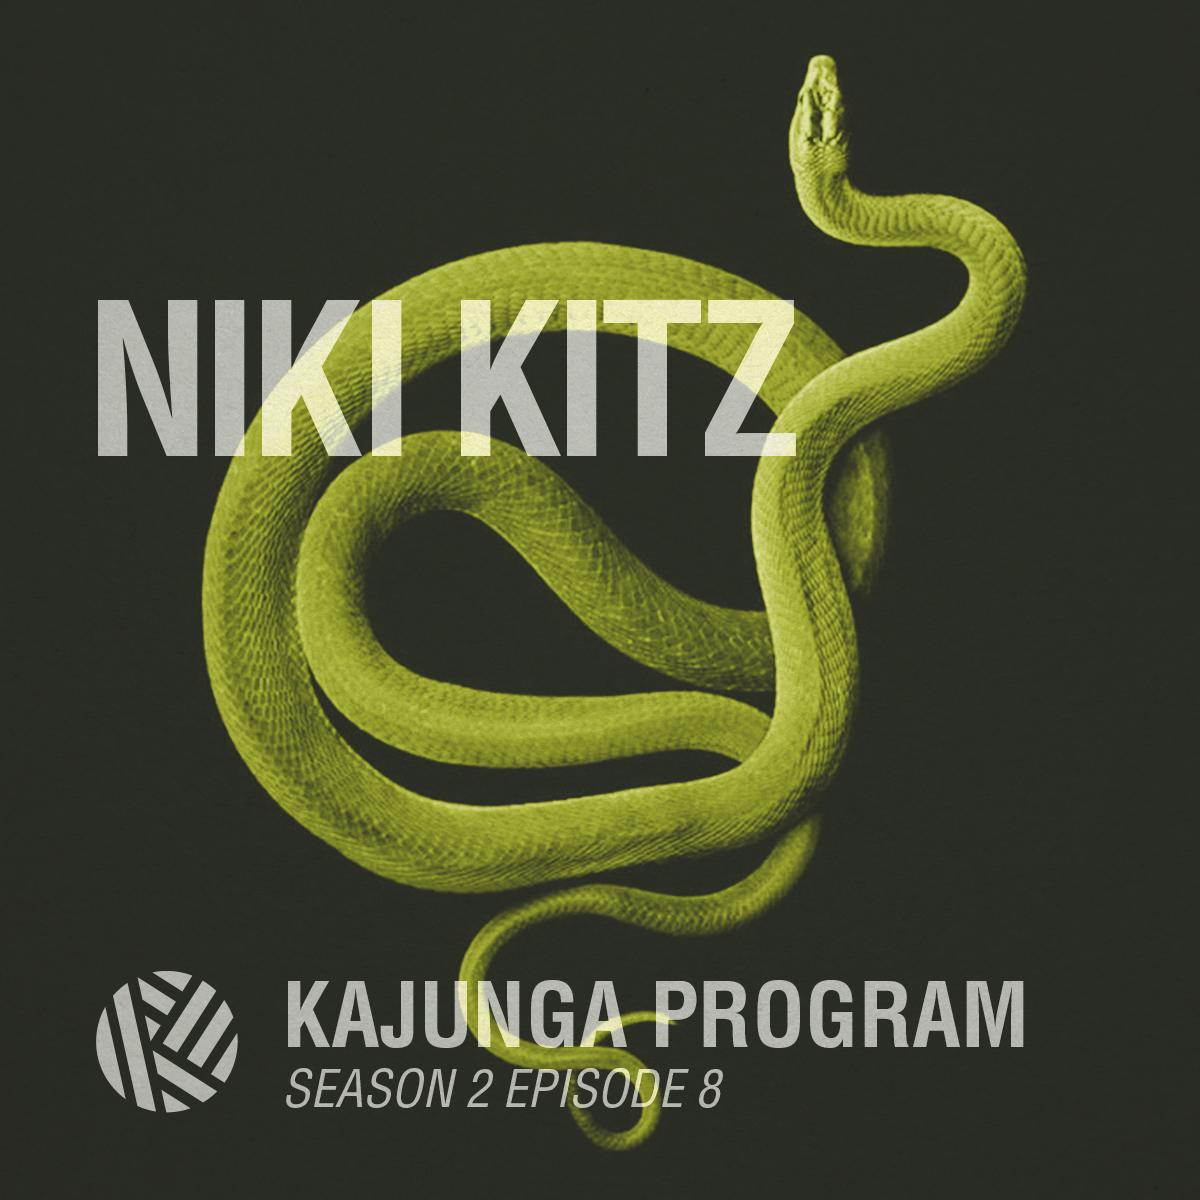 Kajunga_Program_Layout_NikiKitz_V8.jpg